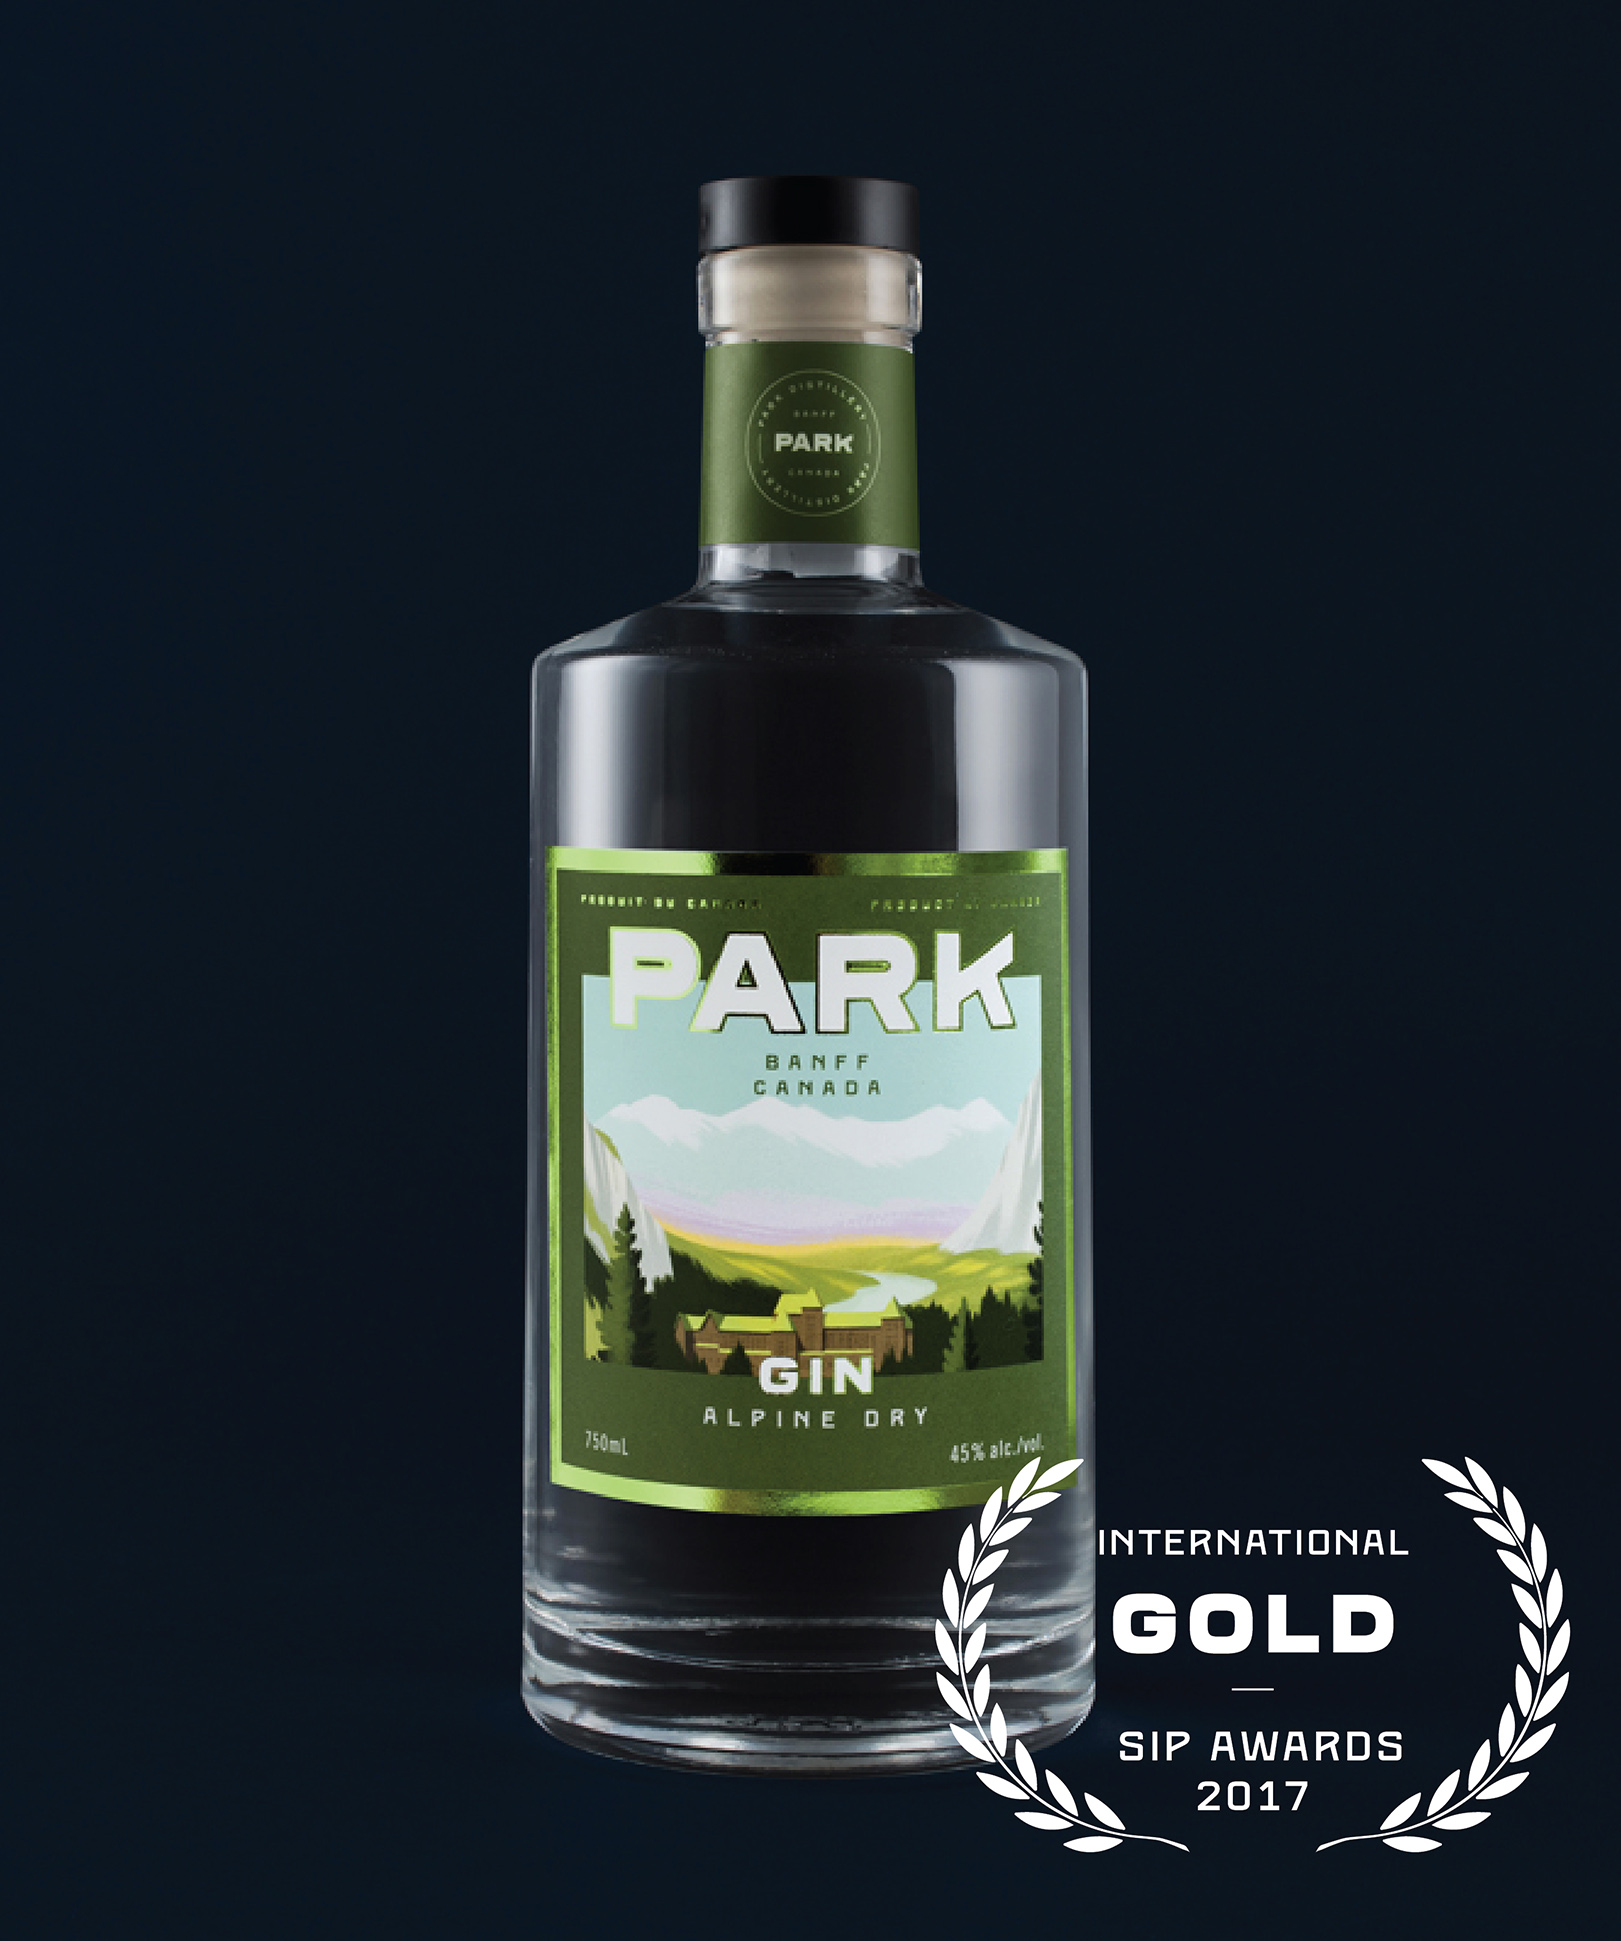 Park Alpine Dry Gin